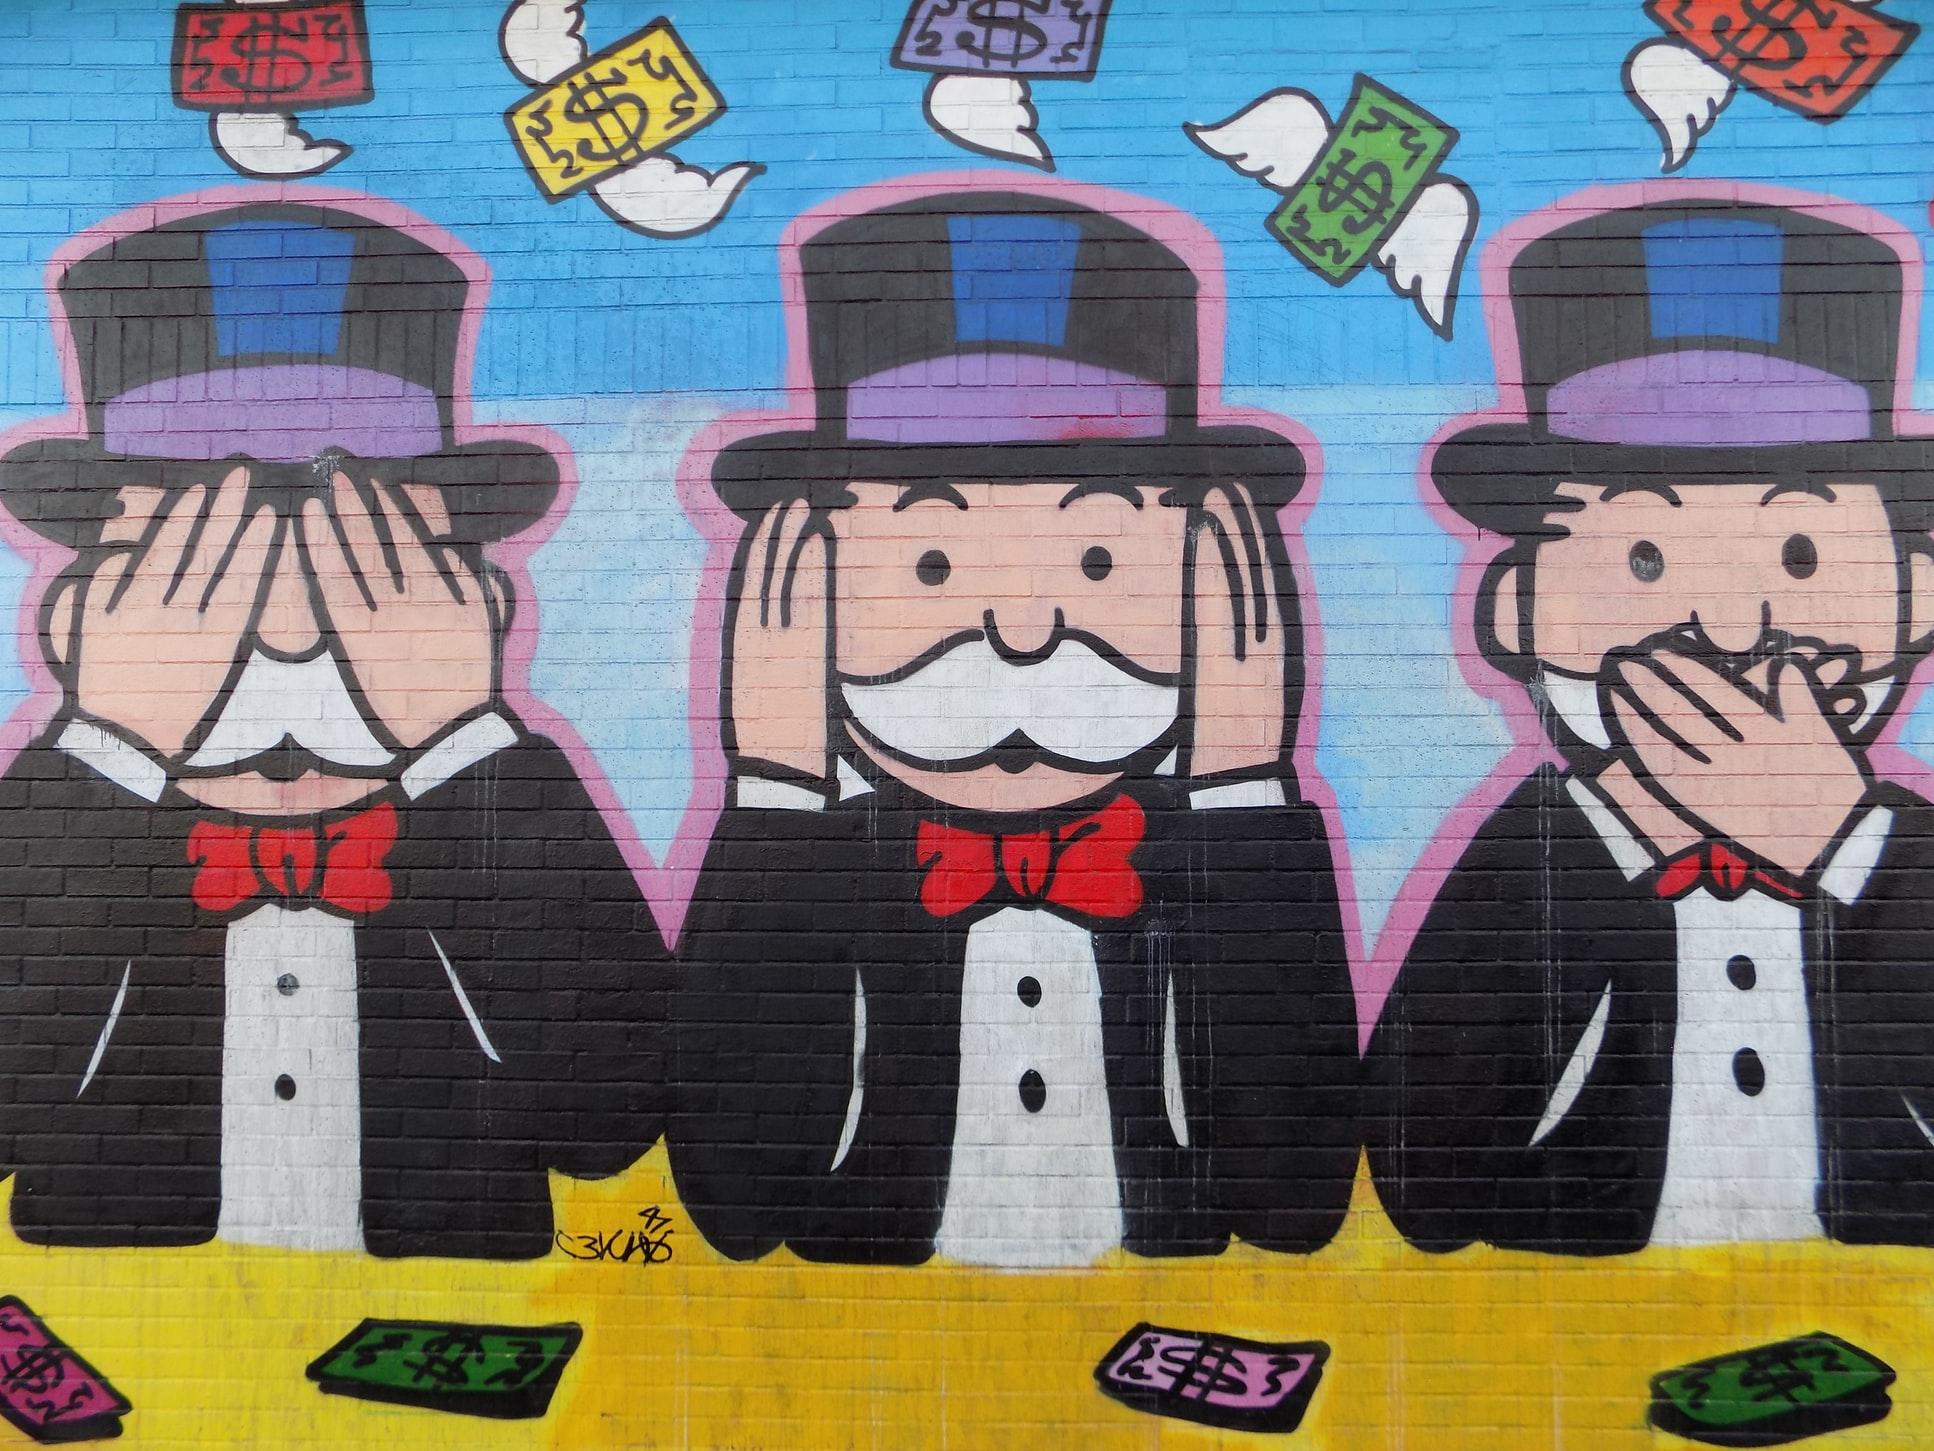 rentalmarket-rentalrealestate-singlefamilyrentals-investorfears